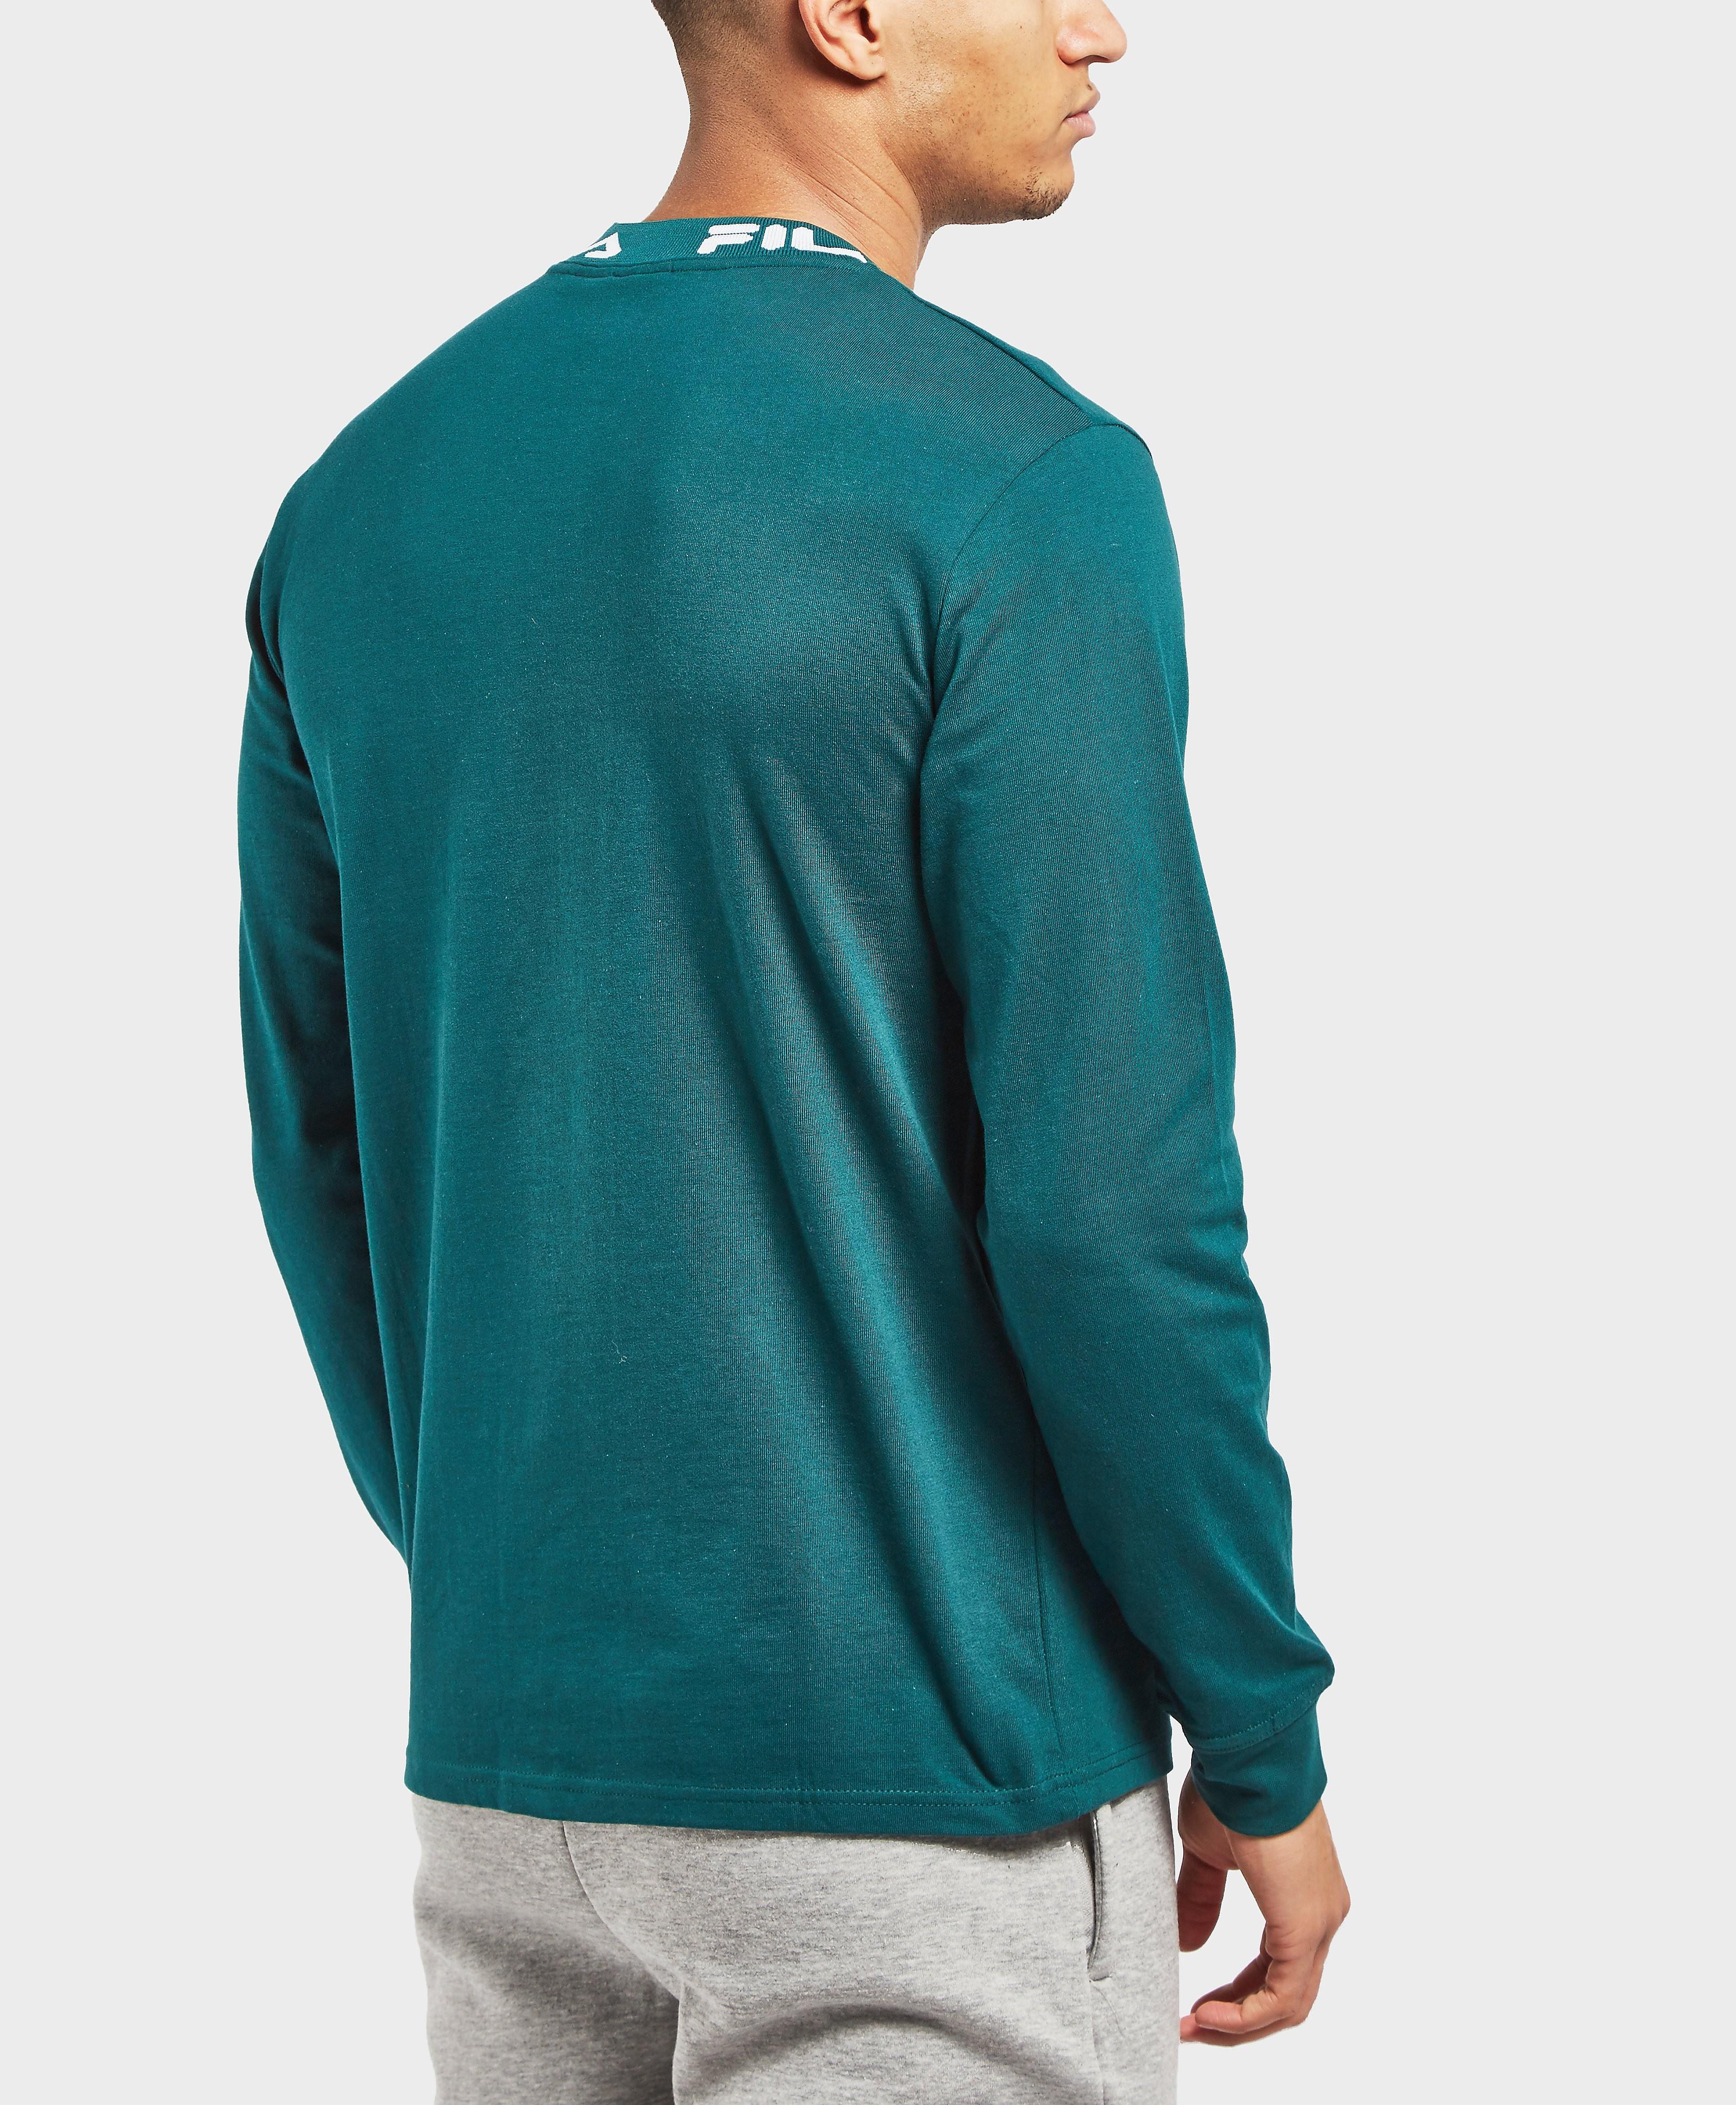 Fila Gigante Long Sleeve T-Shirt